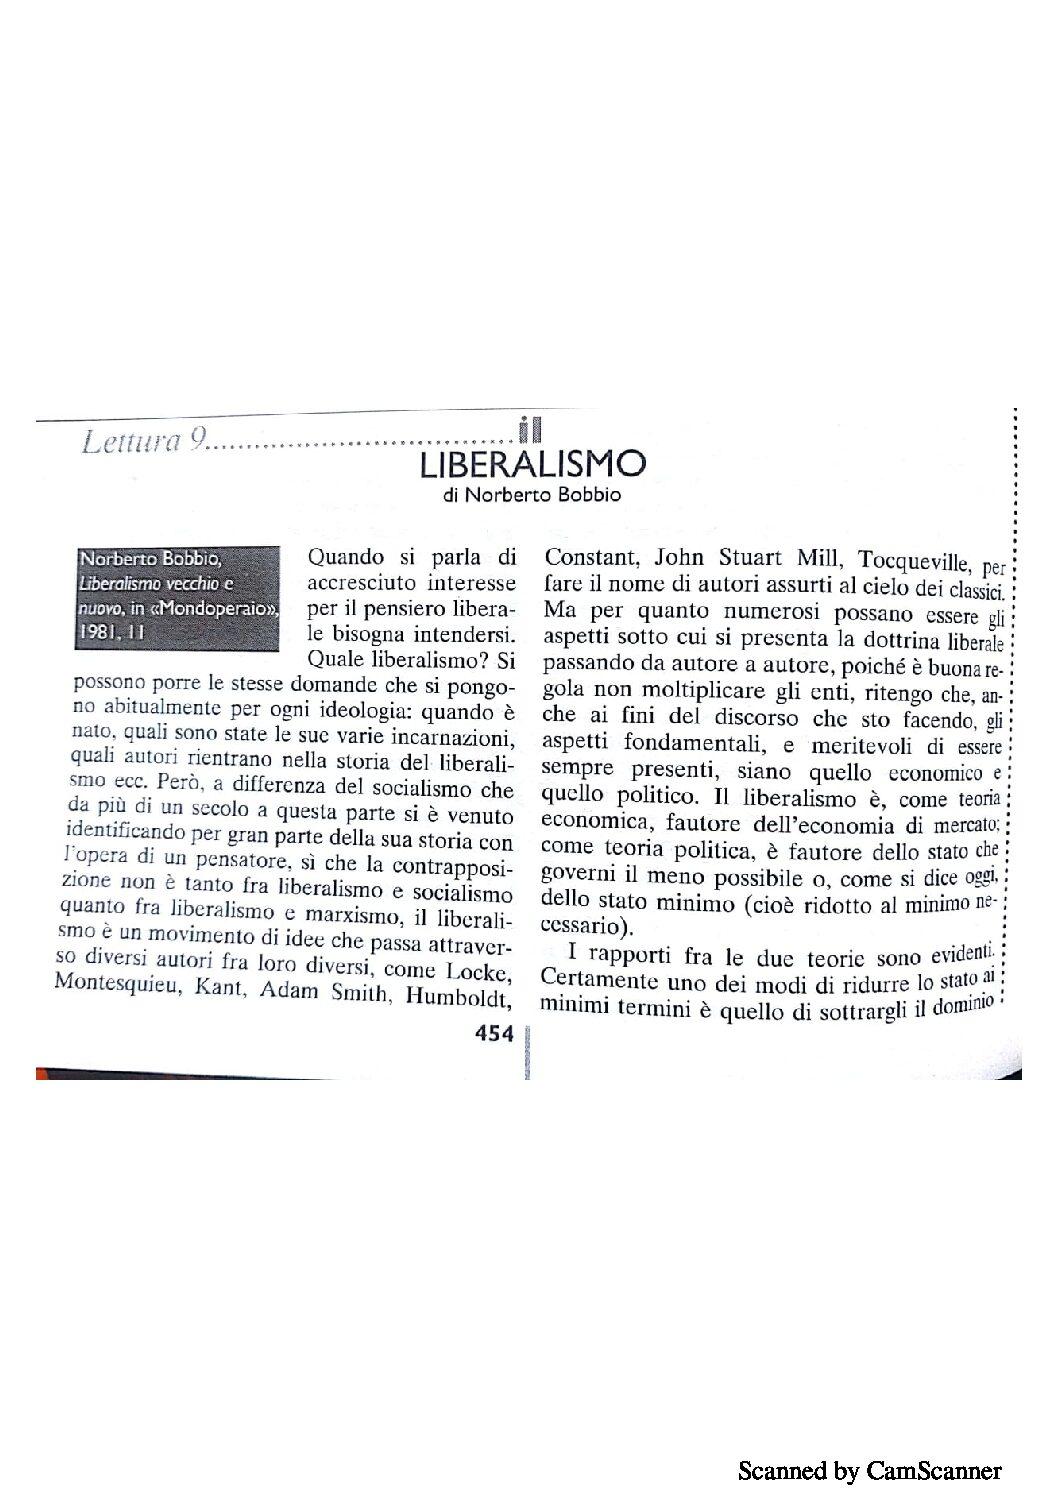 LIBERALISMO NORBERTO BOBBIO